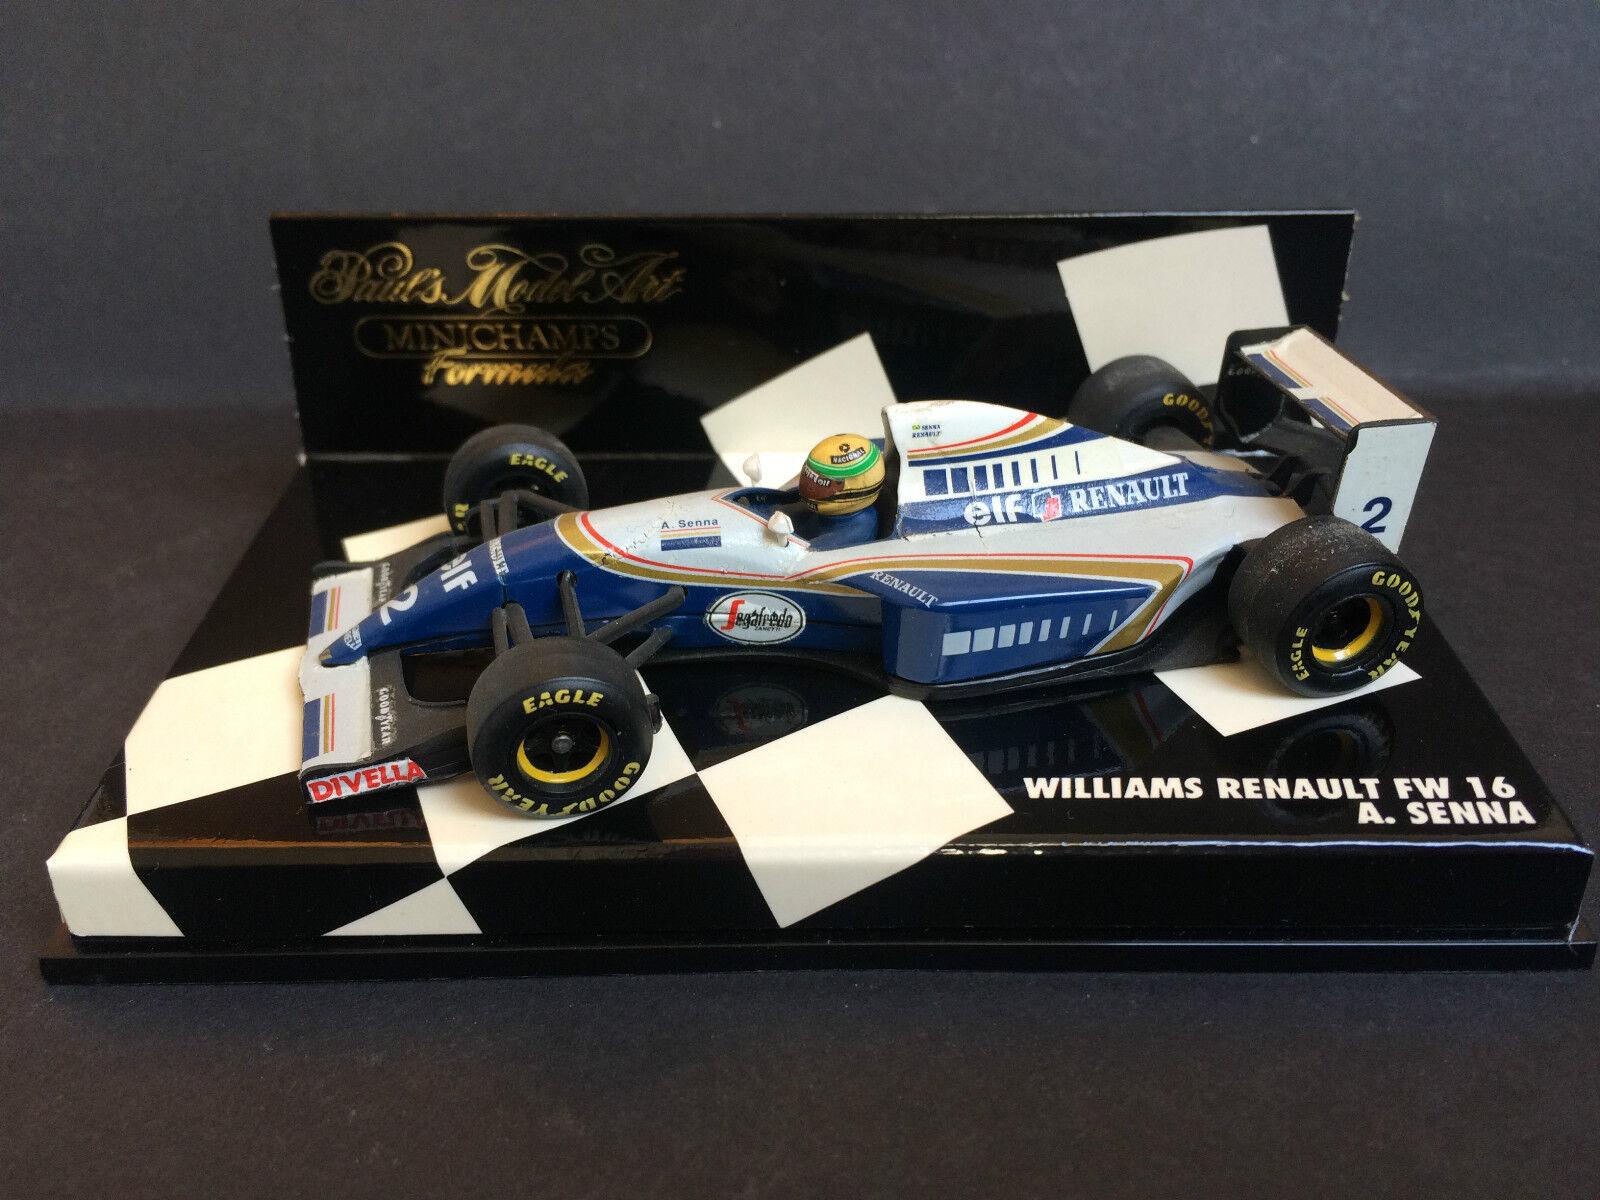 Minichamps - Ayrton Senna - Williams - FW16 - 1 43 - 1994 - Rare